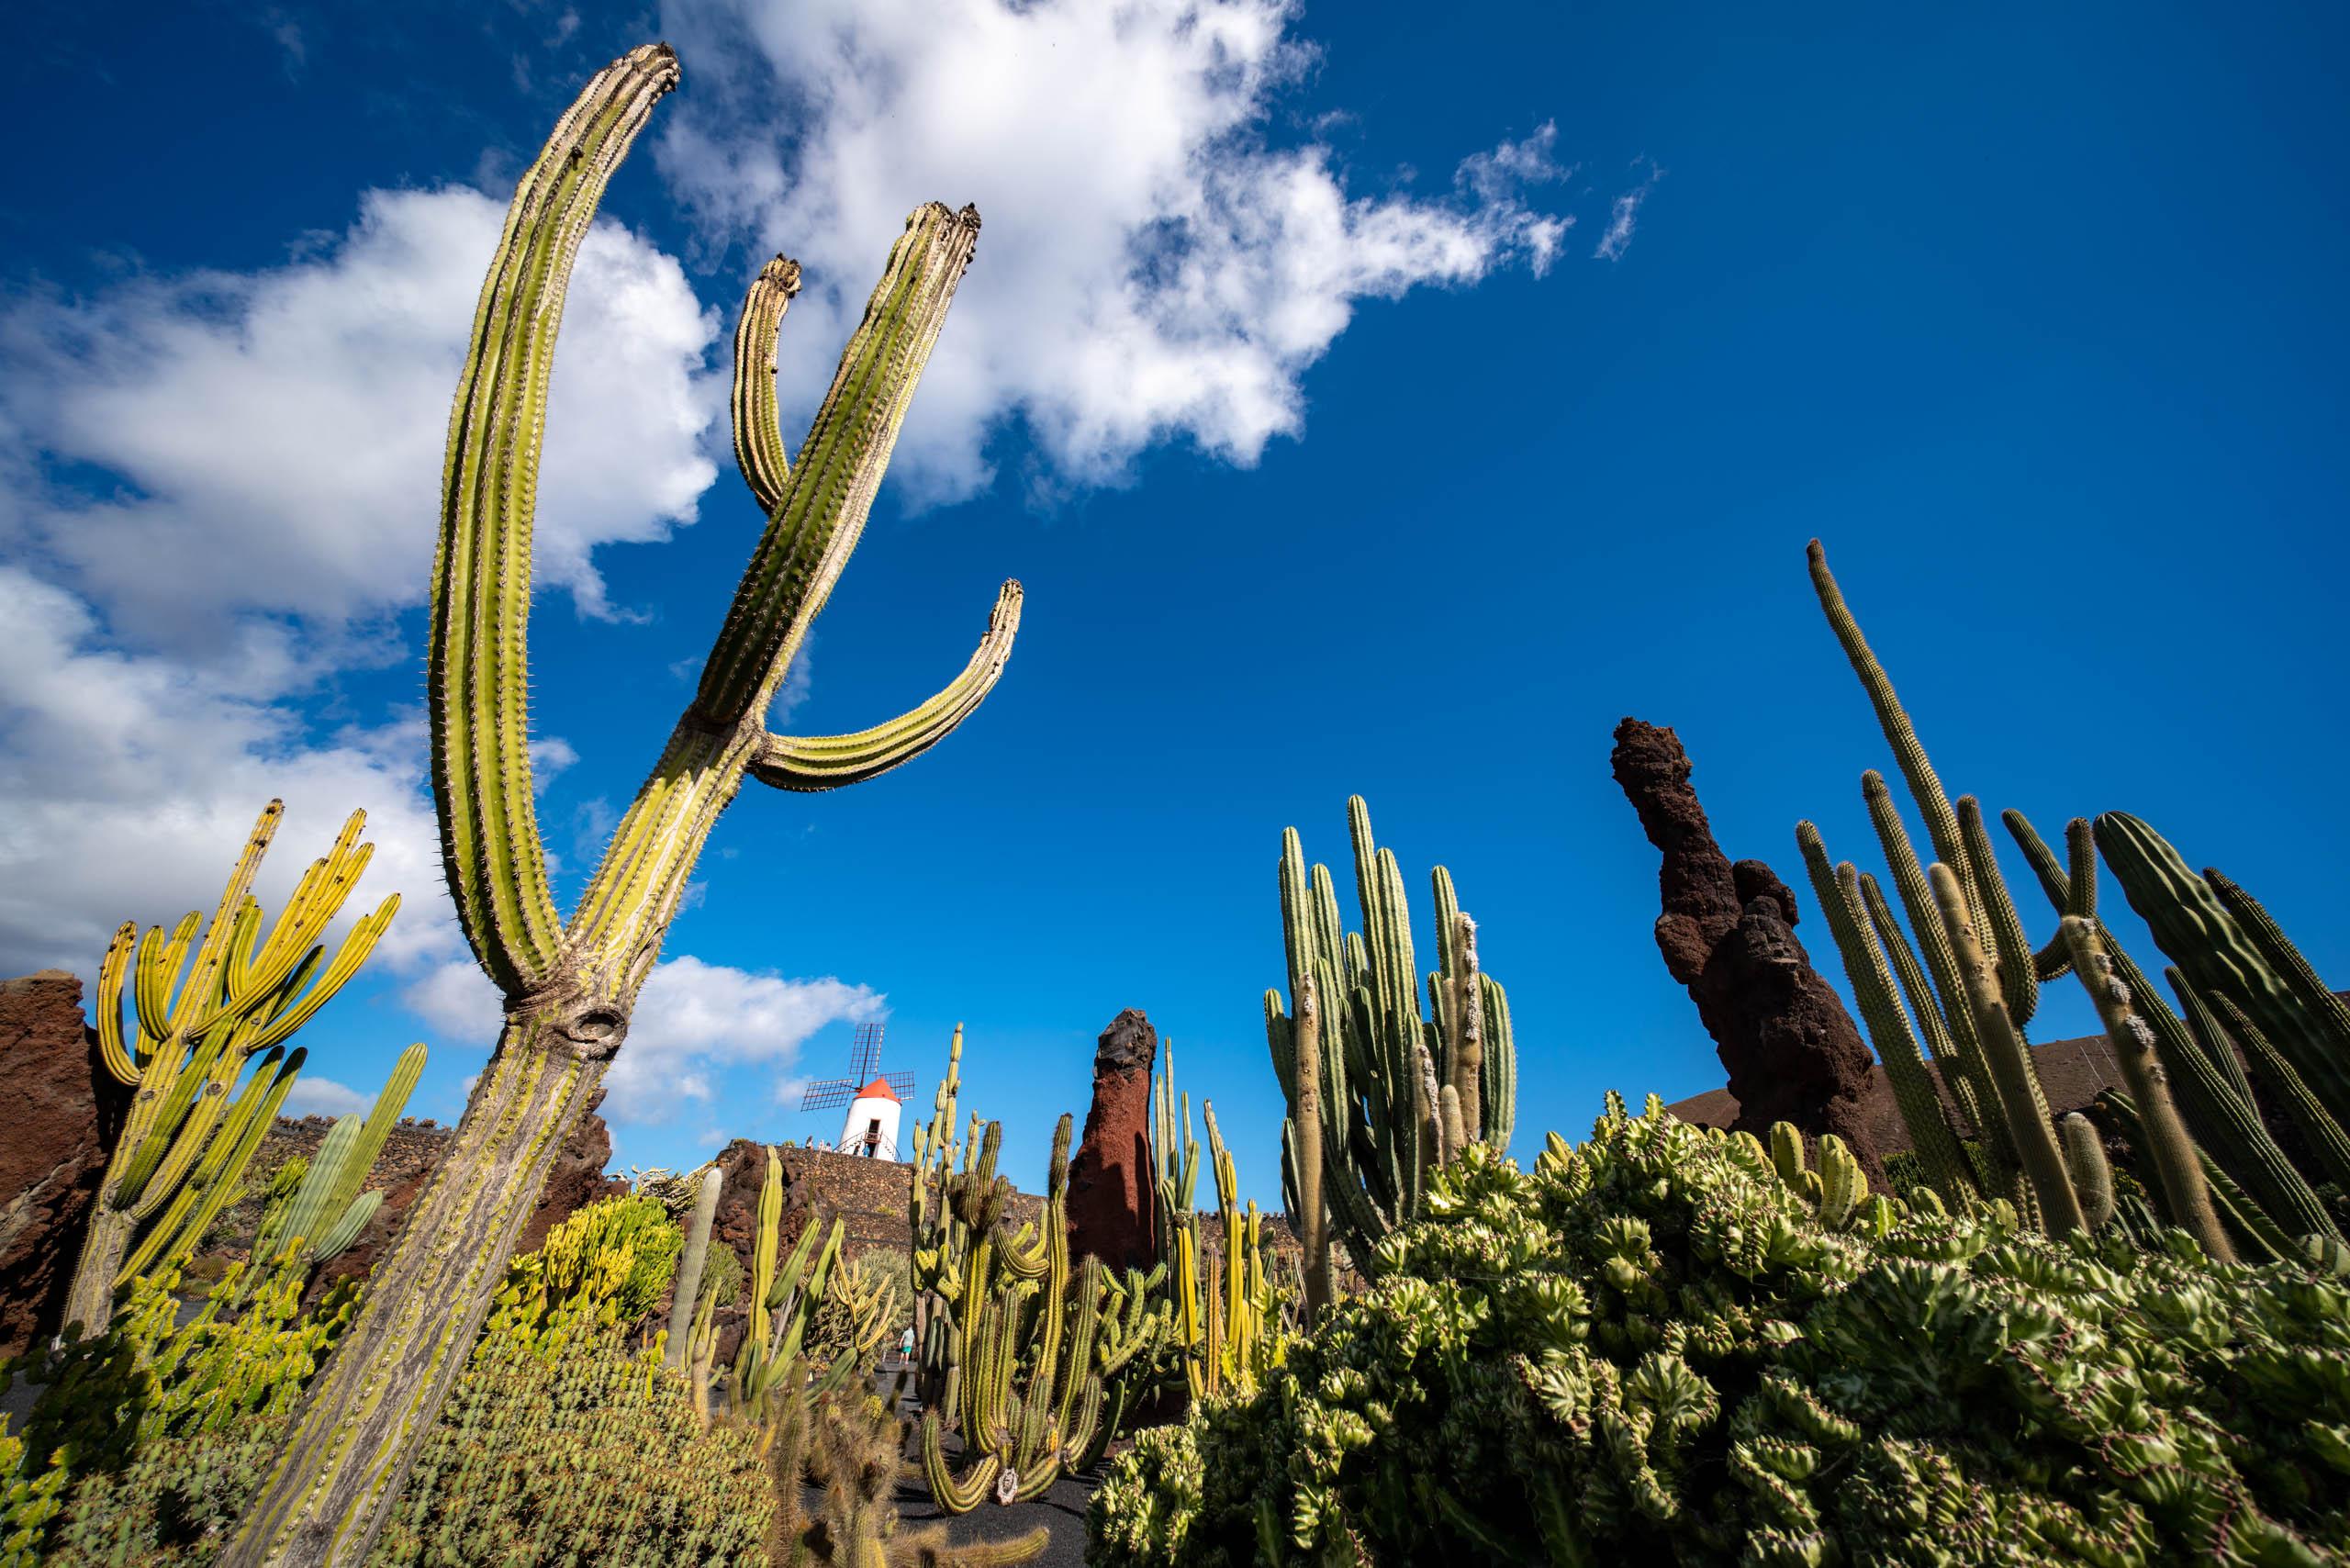 Cactus Garden 2 | f/8 1/400sec ISO-100 12mm  | ILCE-7RM3 | 2019-01-27 14:27:42